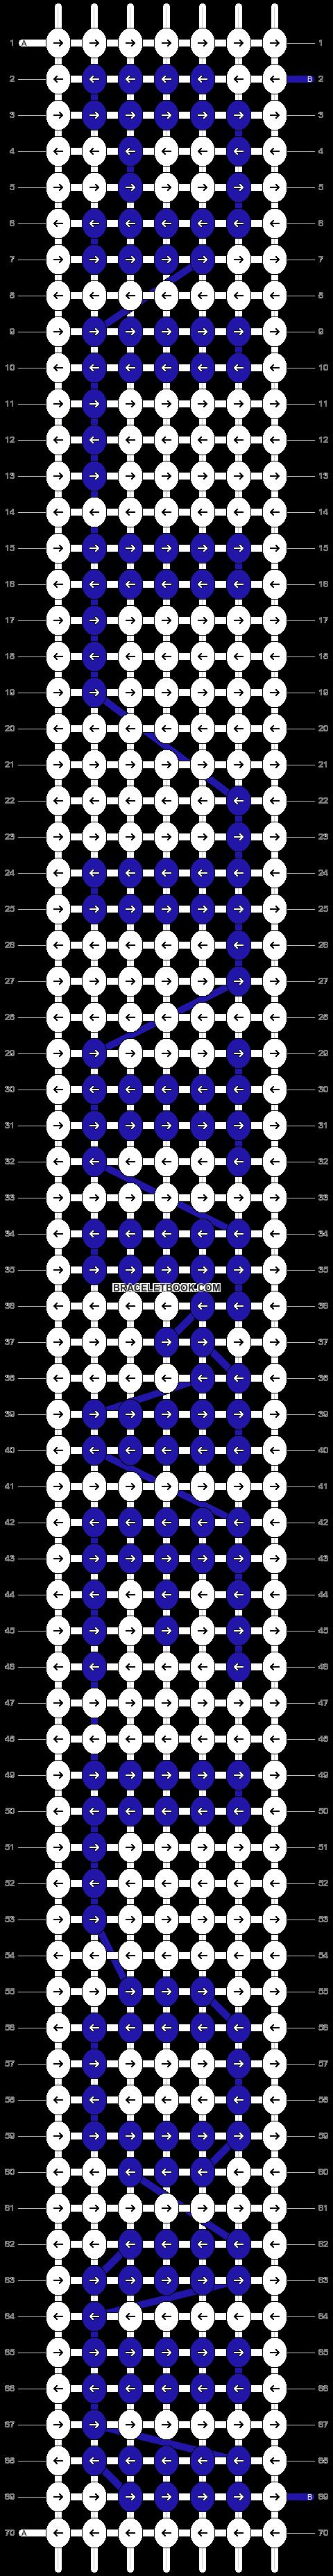 Alpha pattern #5440 pattern